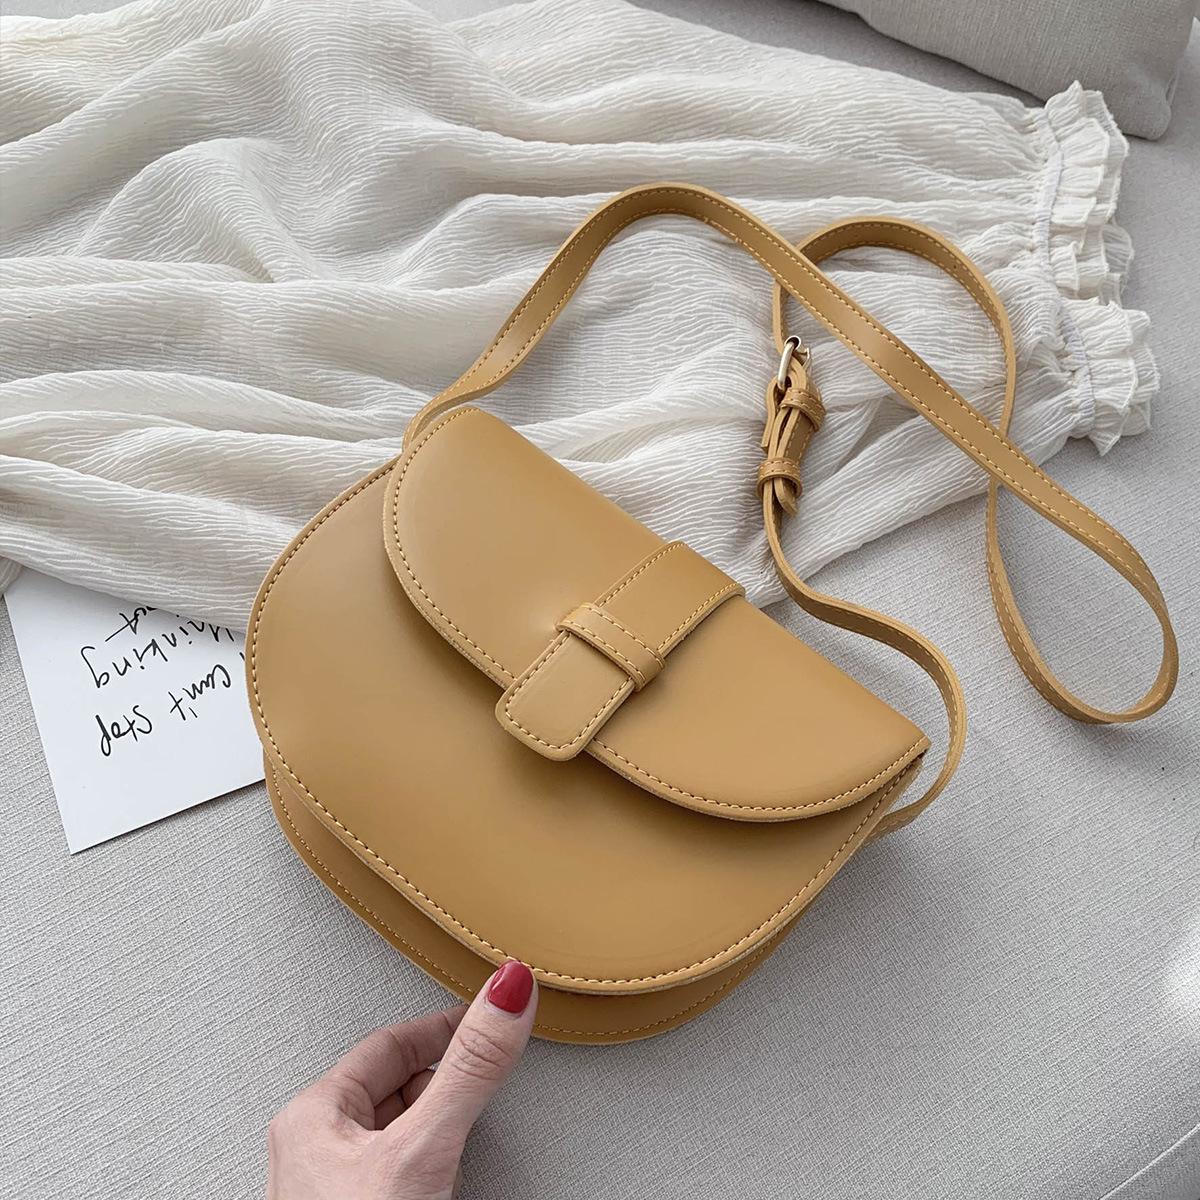 Carlo Daisy bag womens versatile saddle bag temperament fashion single shoulder bag retro ins messenger bag 2020 NEW